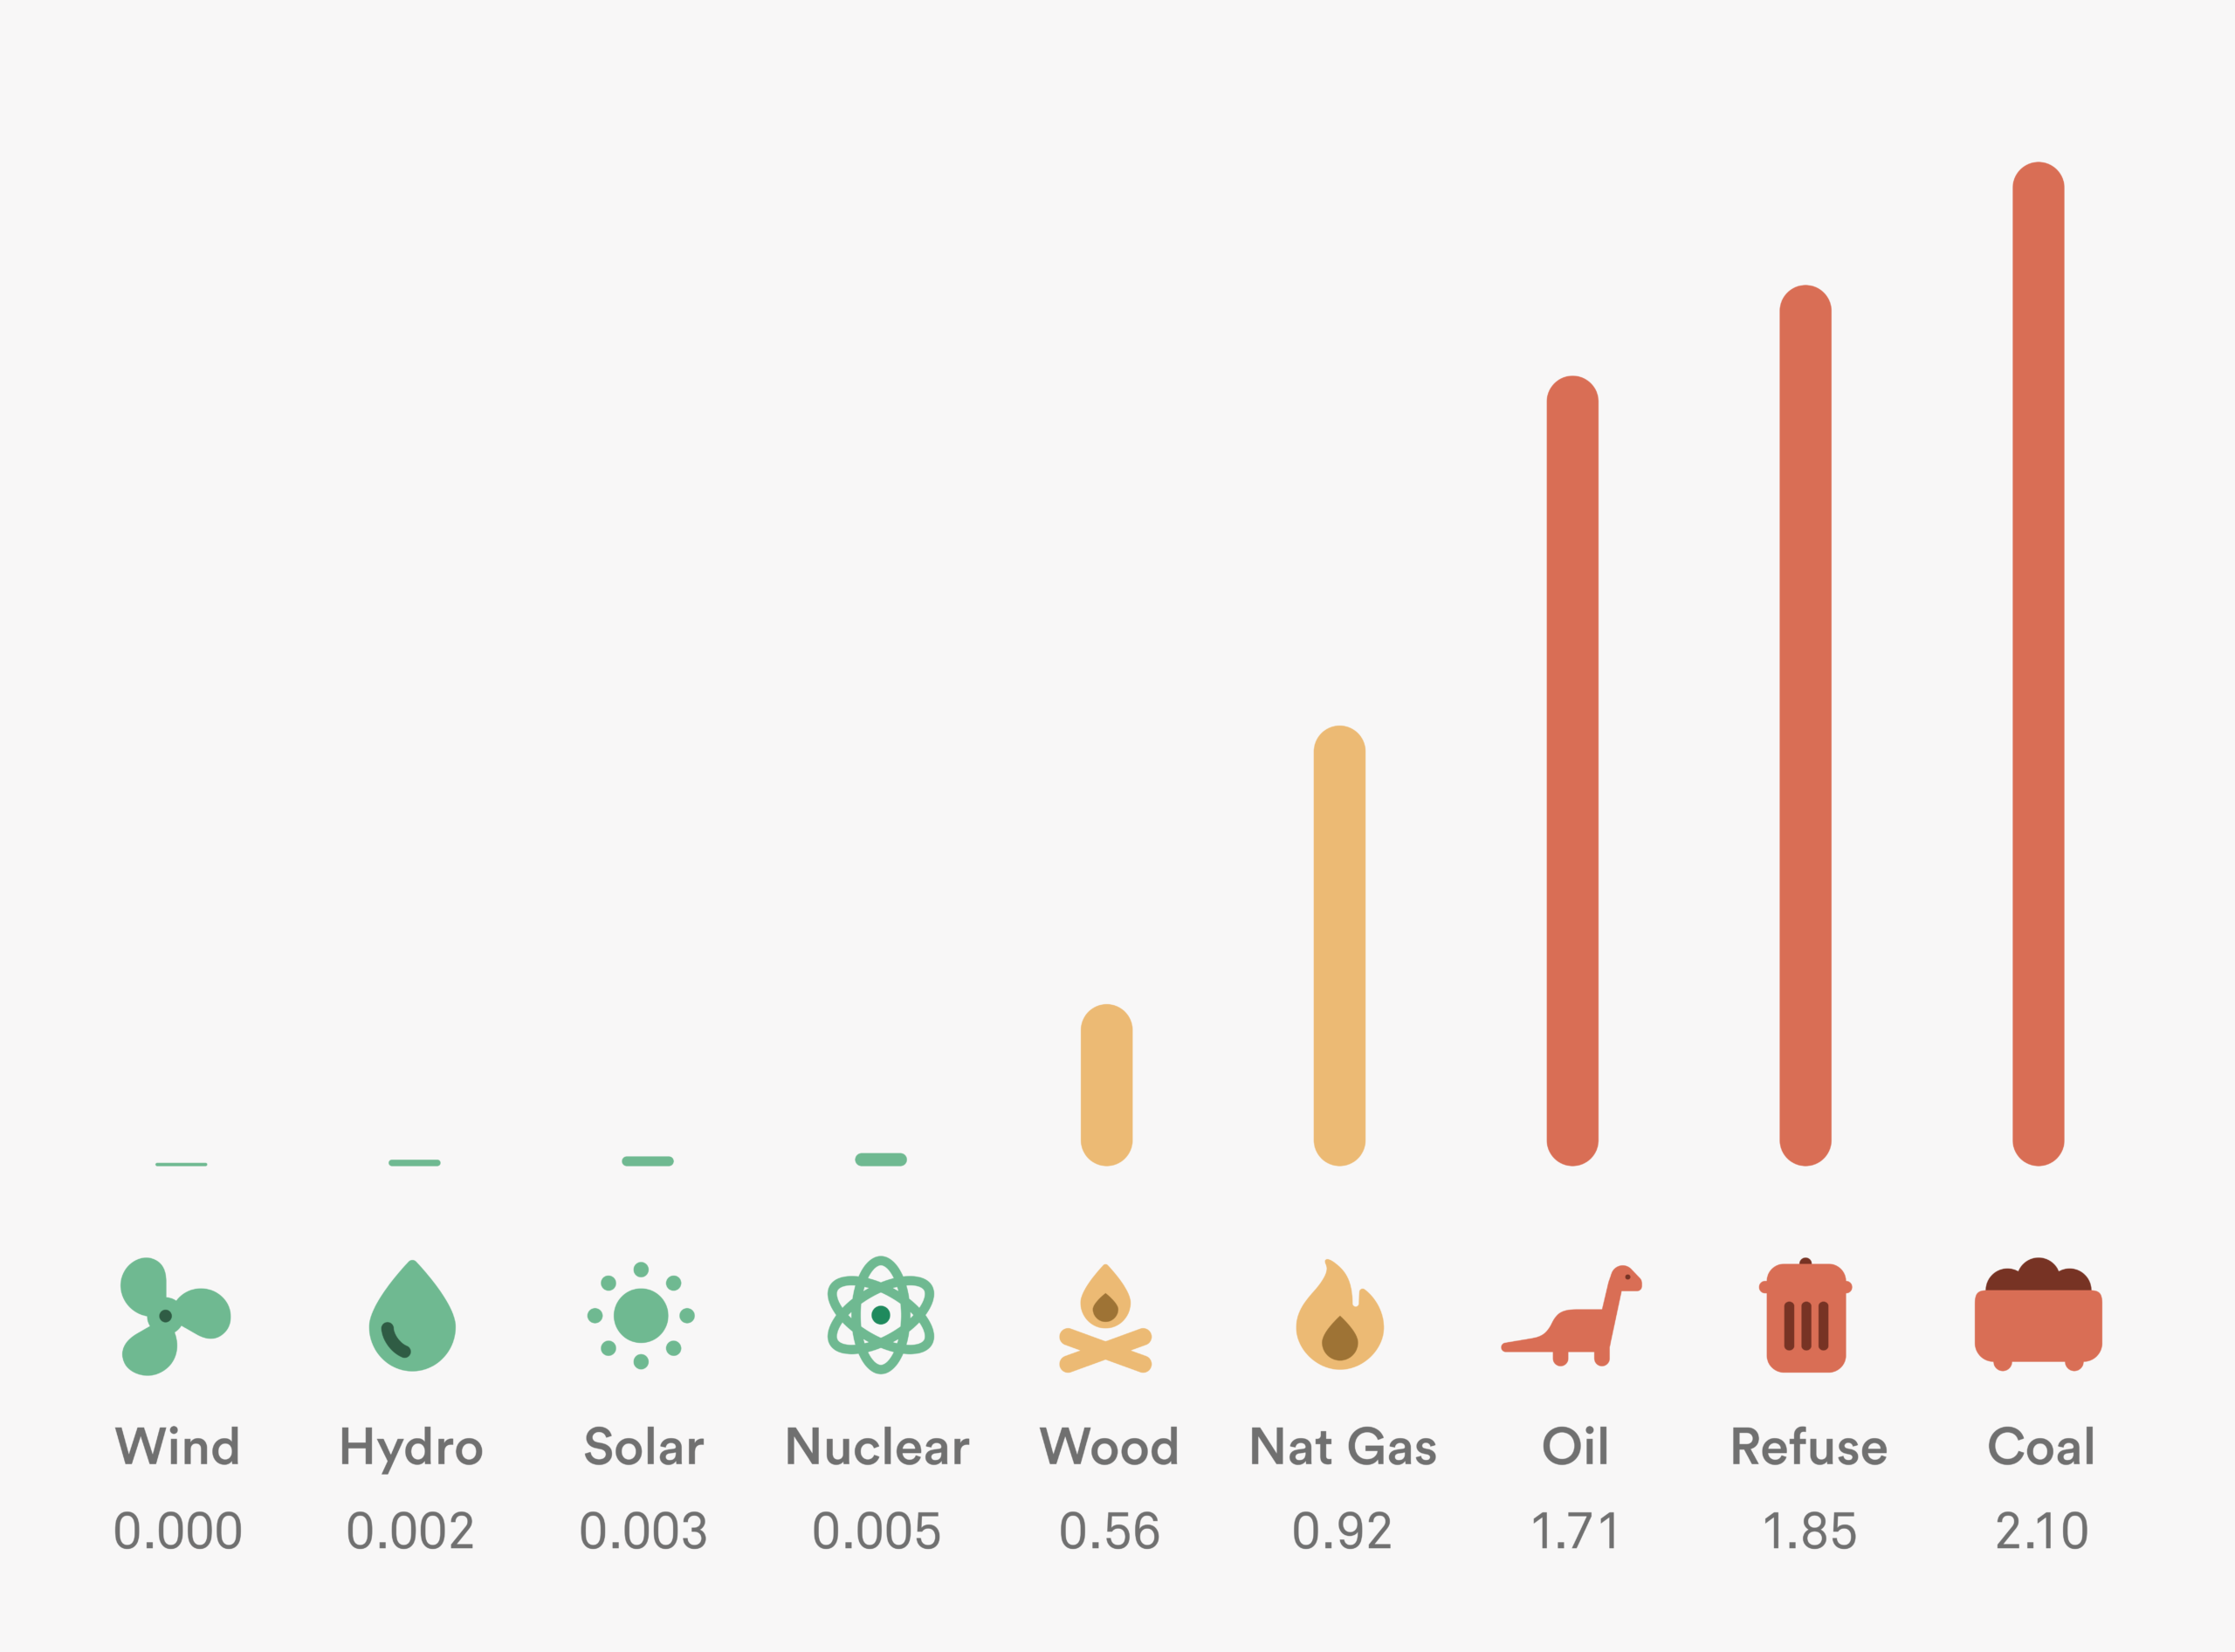 fuel type carbon intensity